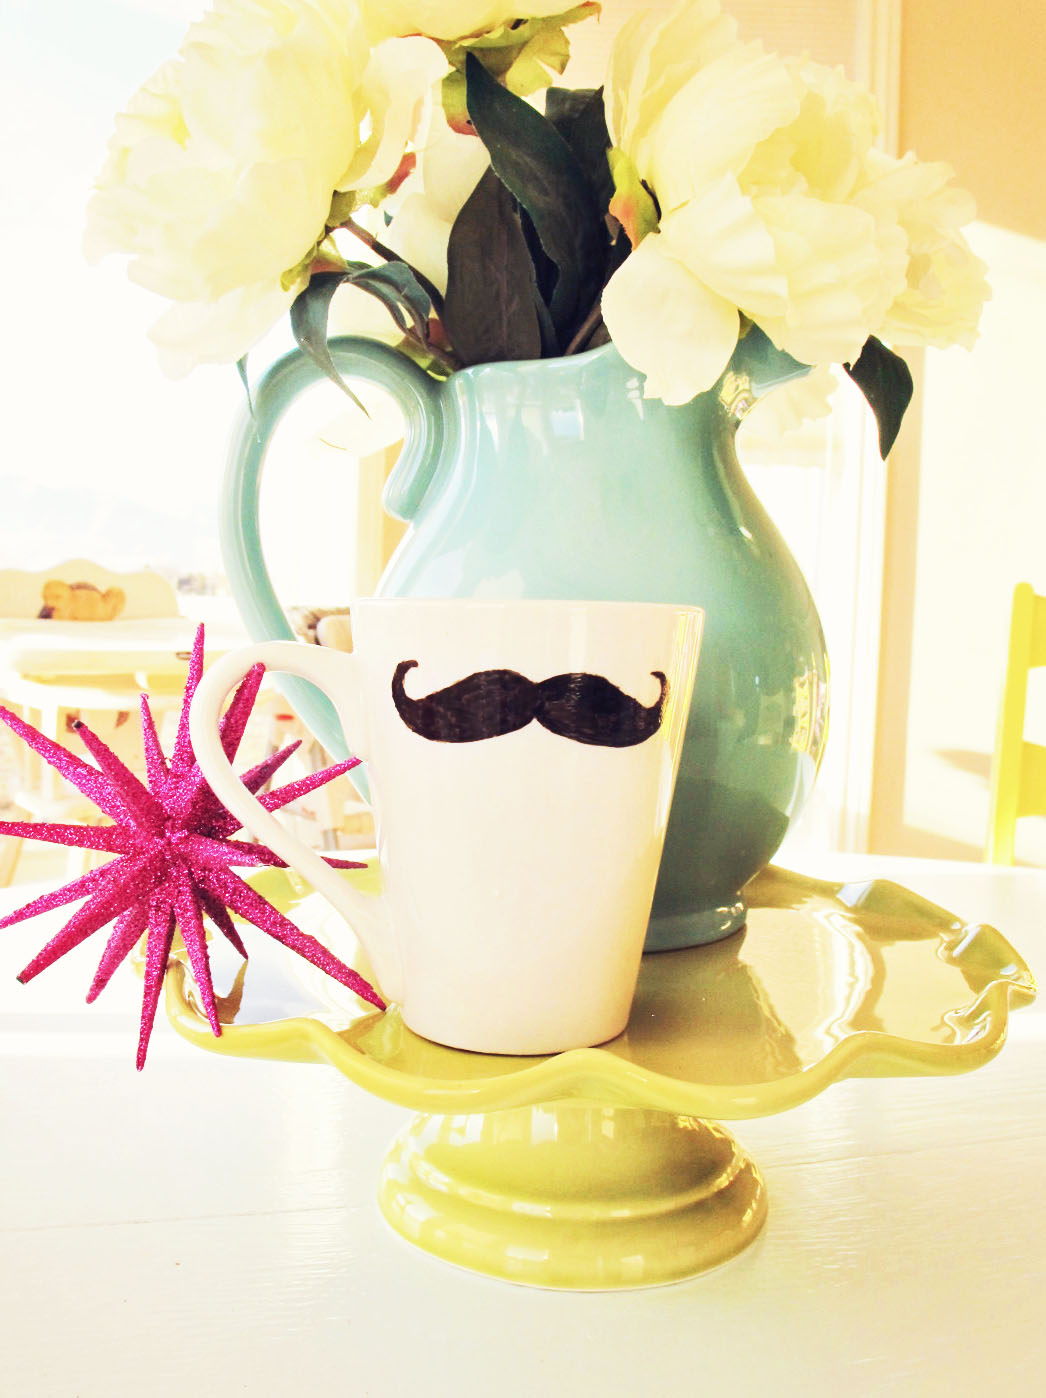 Kaffebecher mit Bart